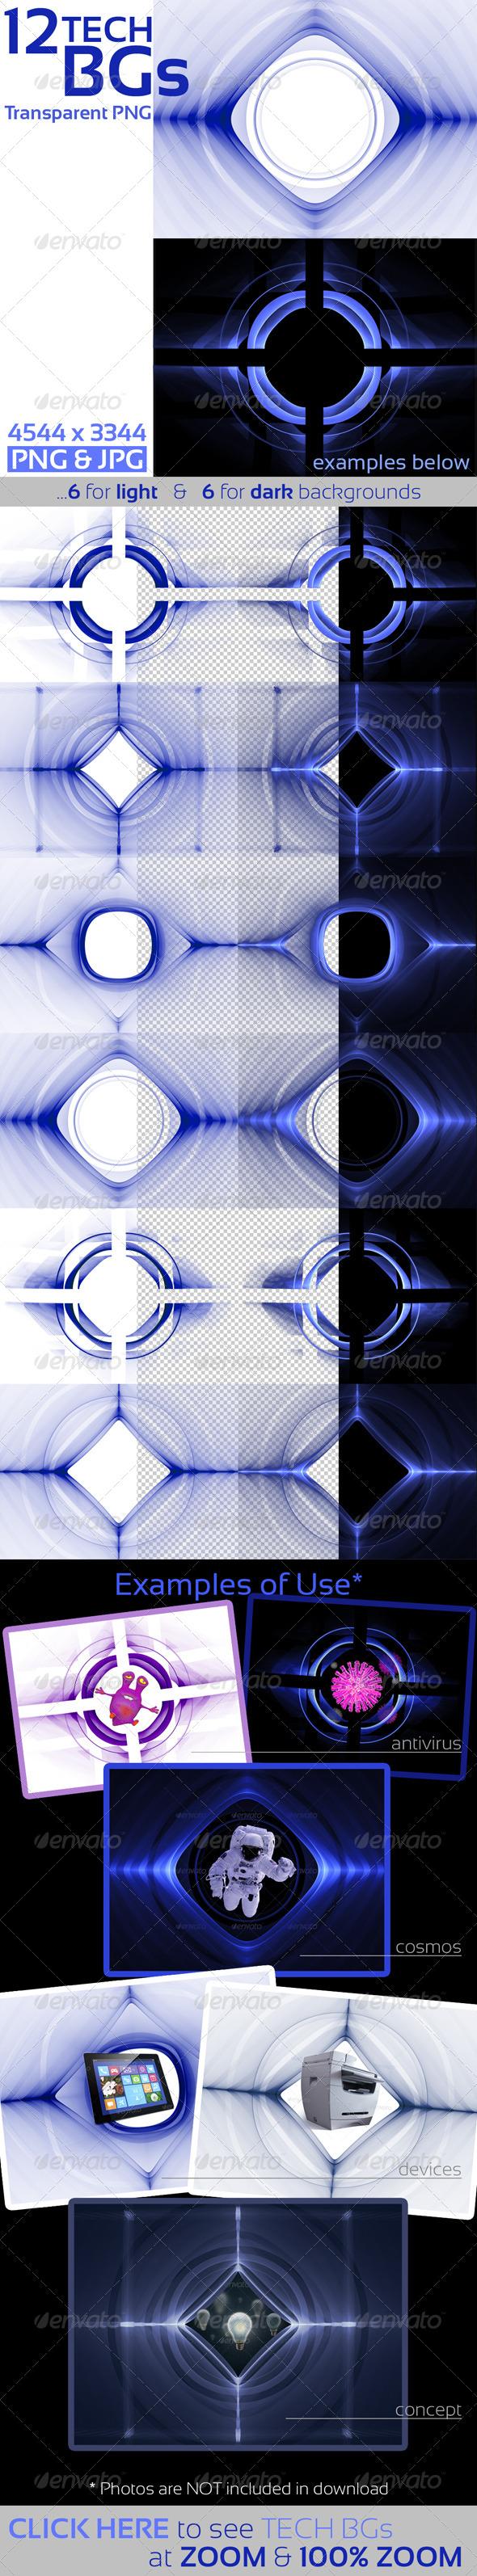 Tech Templates on Transparent Background - Tech / Futuristic Backgrounds